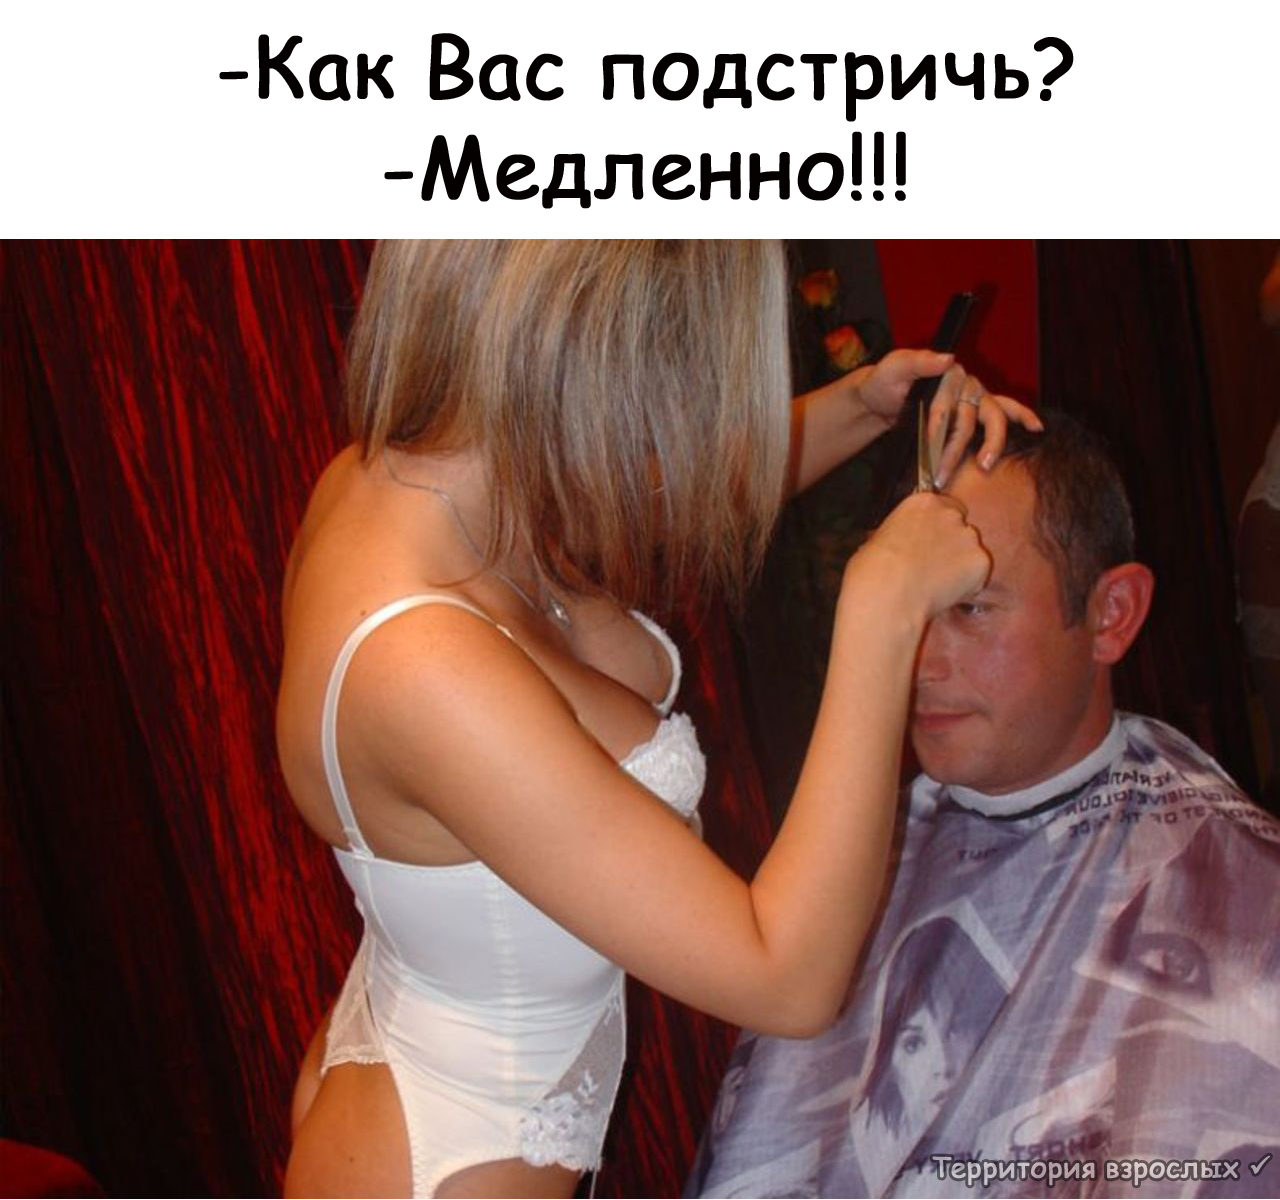 image?id=896158443776&t=3&plc=WEB&tkn=*y